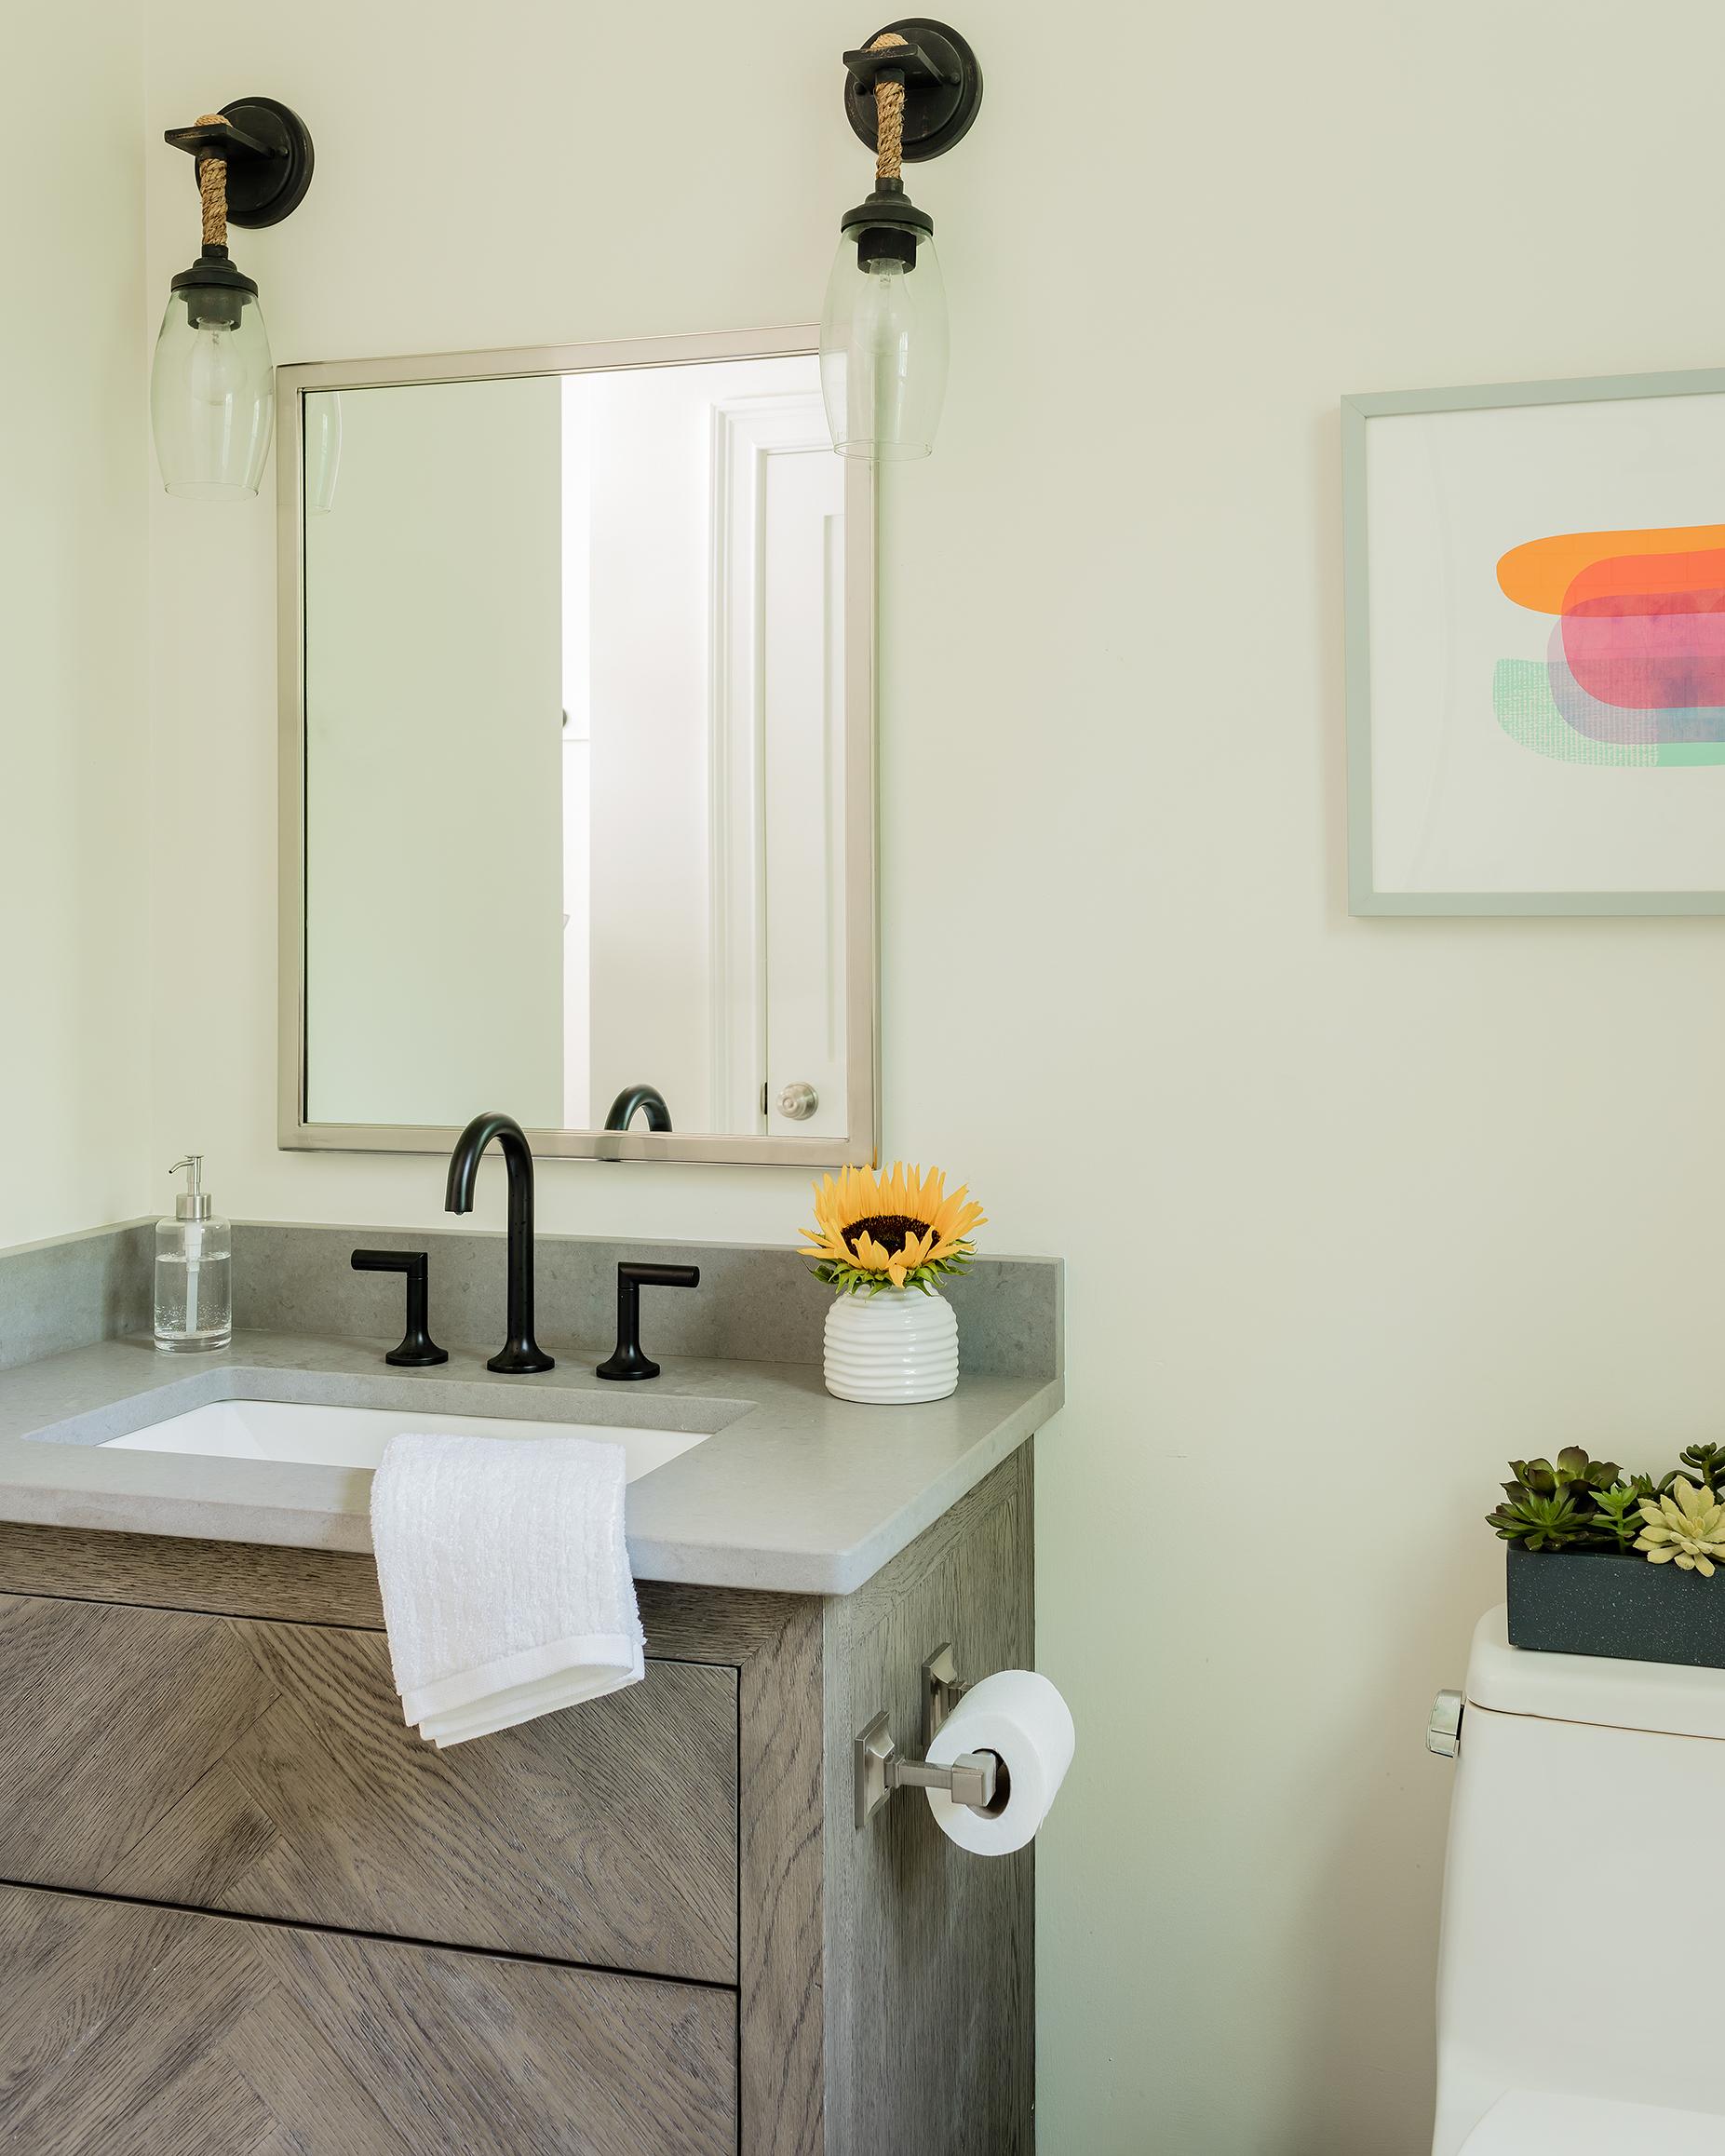 Concrete-Look Quartz Countertop | Kelly Rogers Interiors